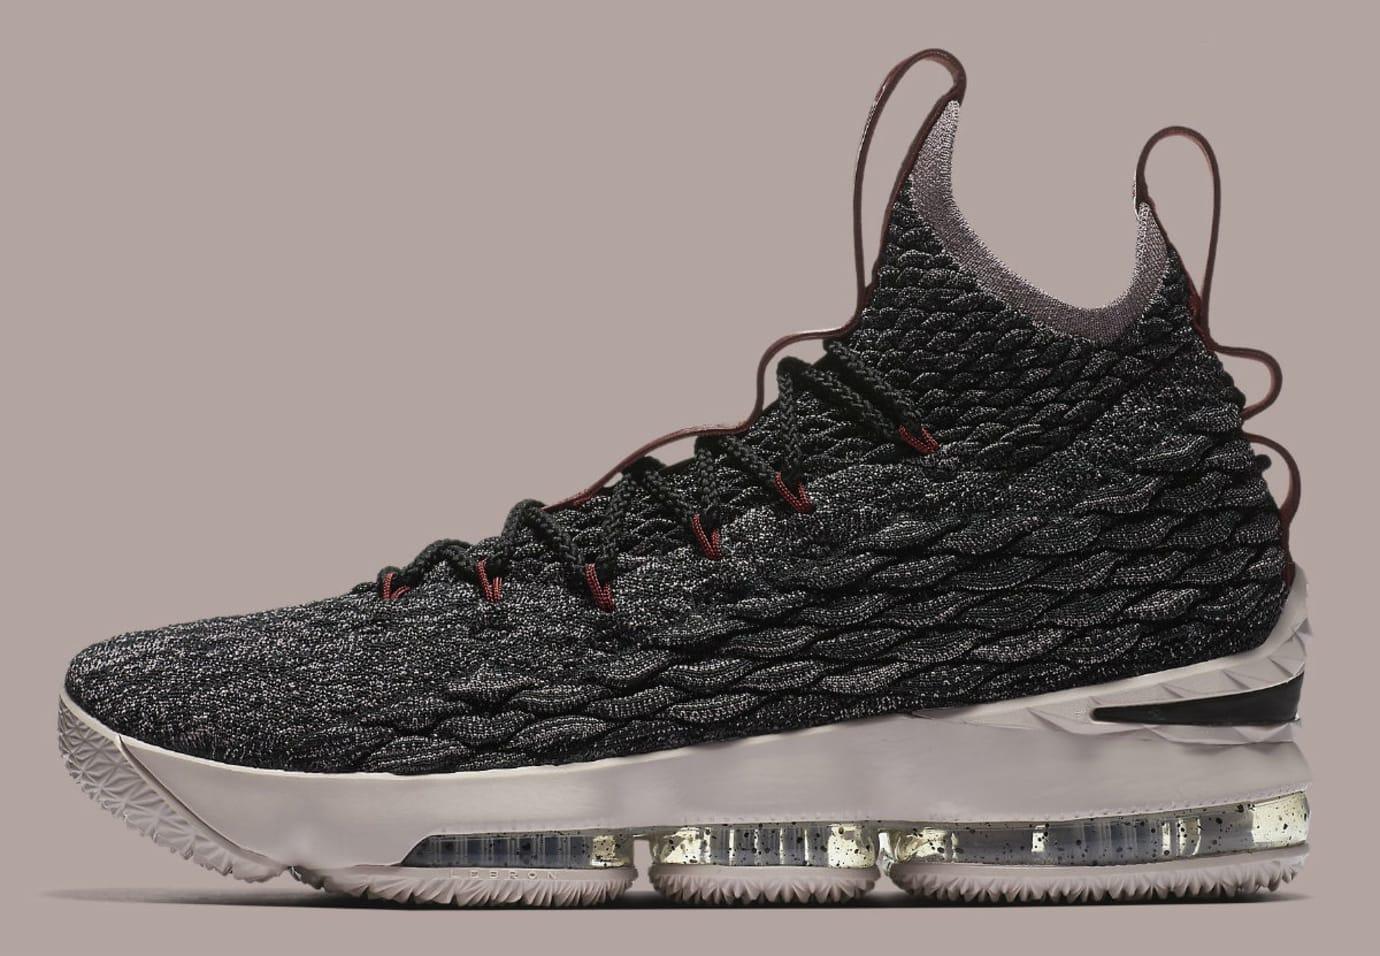 12615634be0 Nike LeBron 15 Pride of Ohio Release date 897648-003 Profile